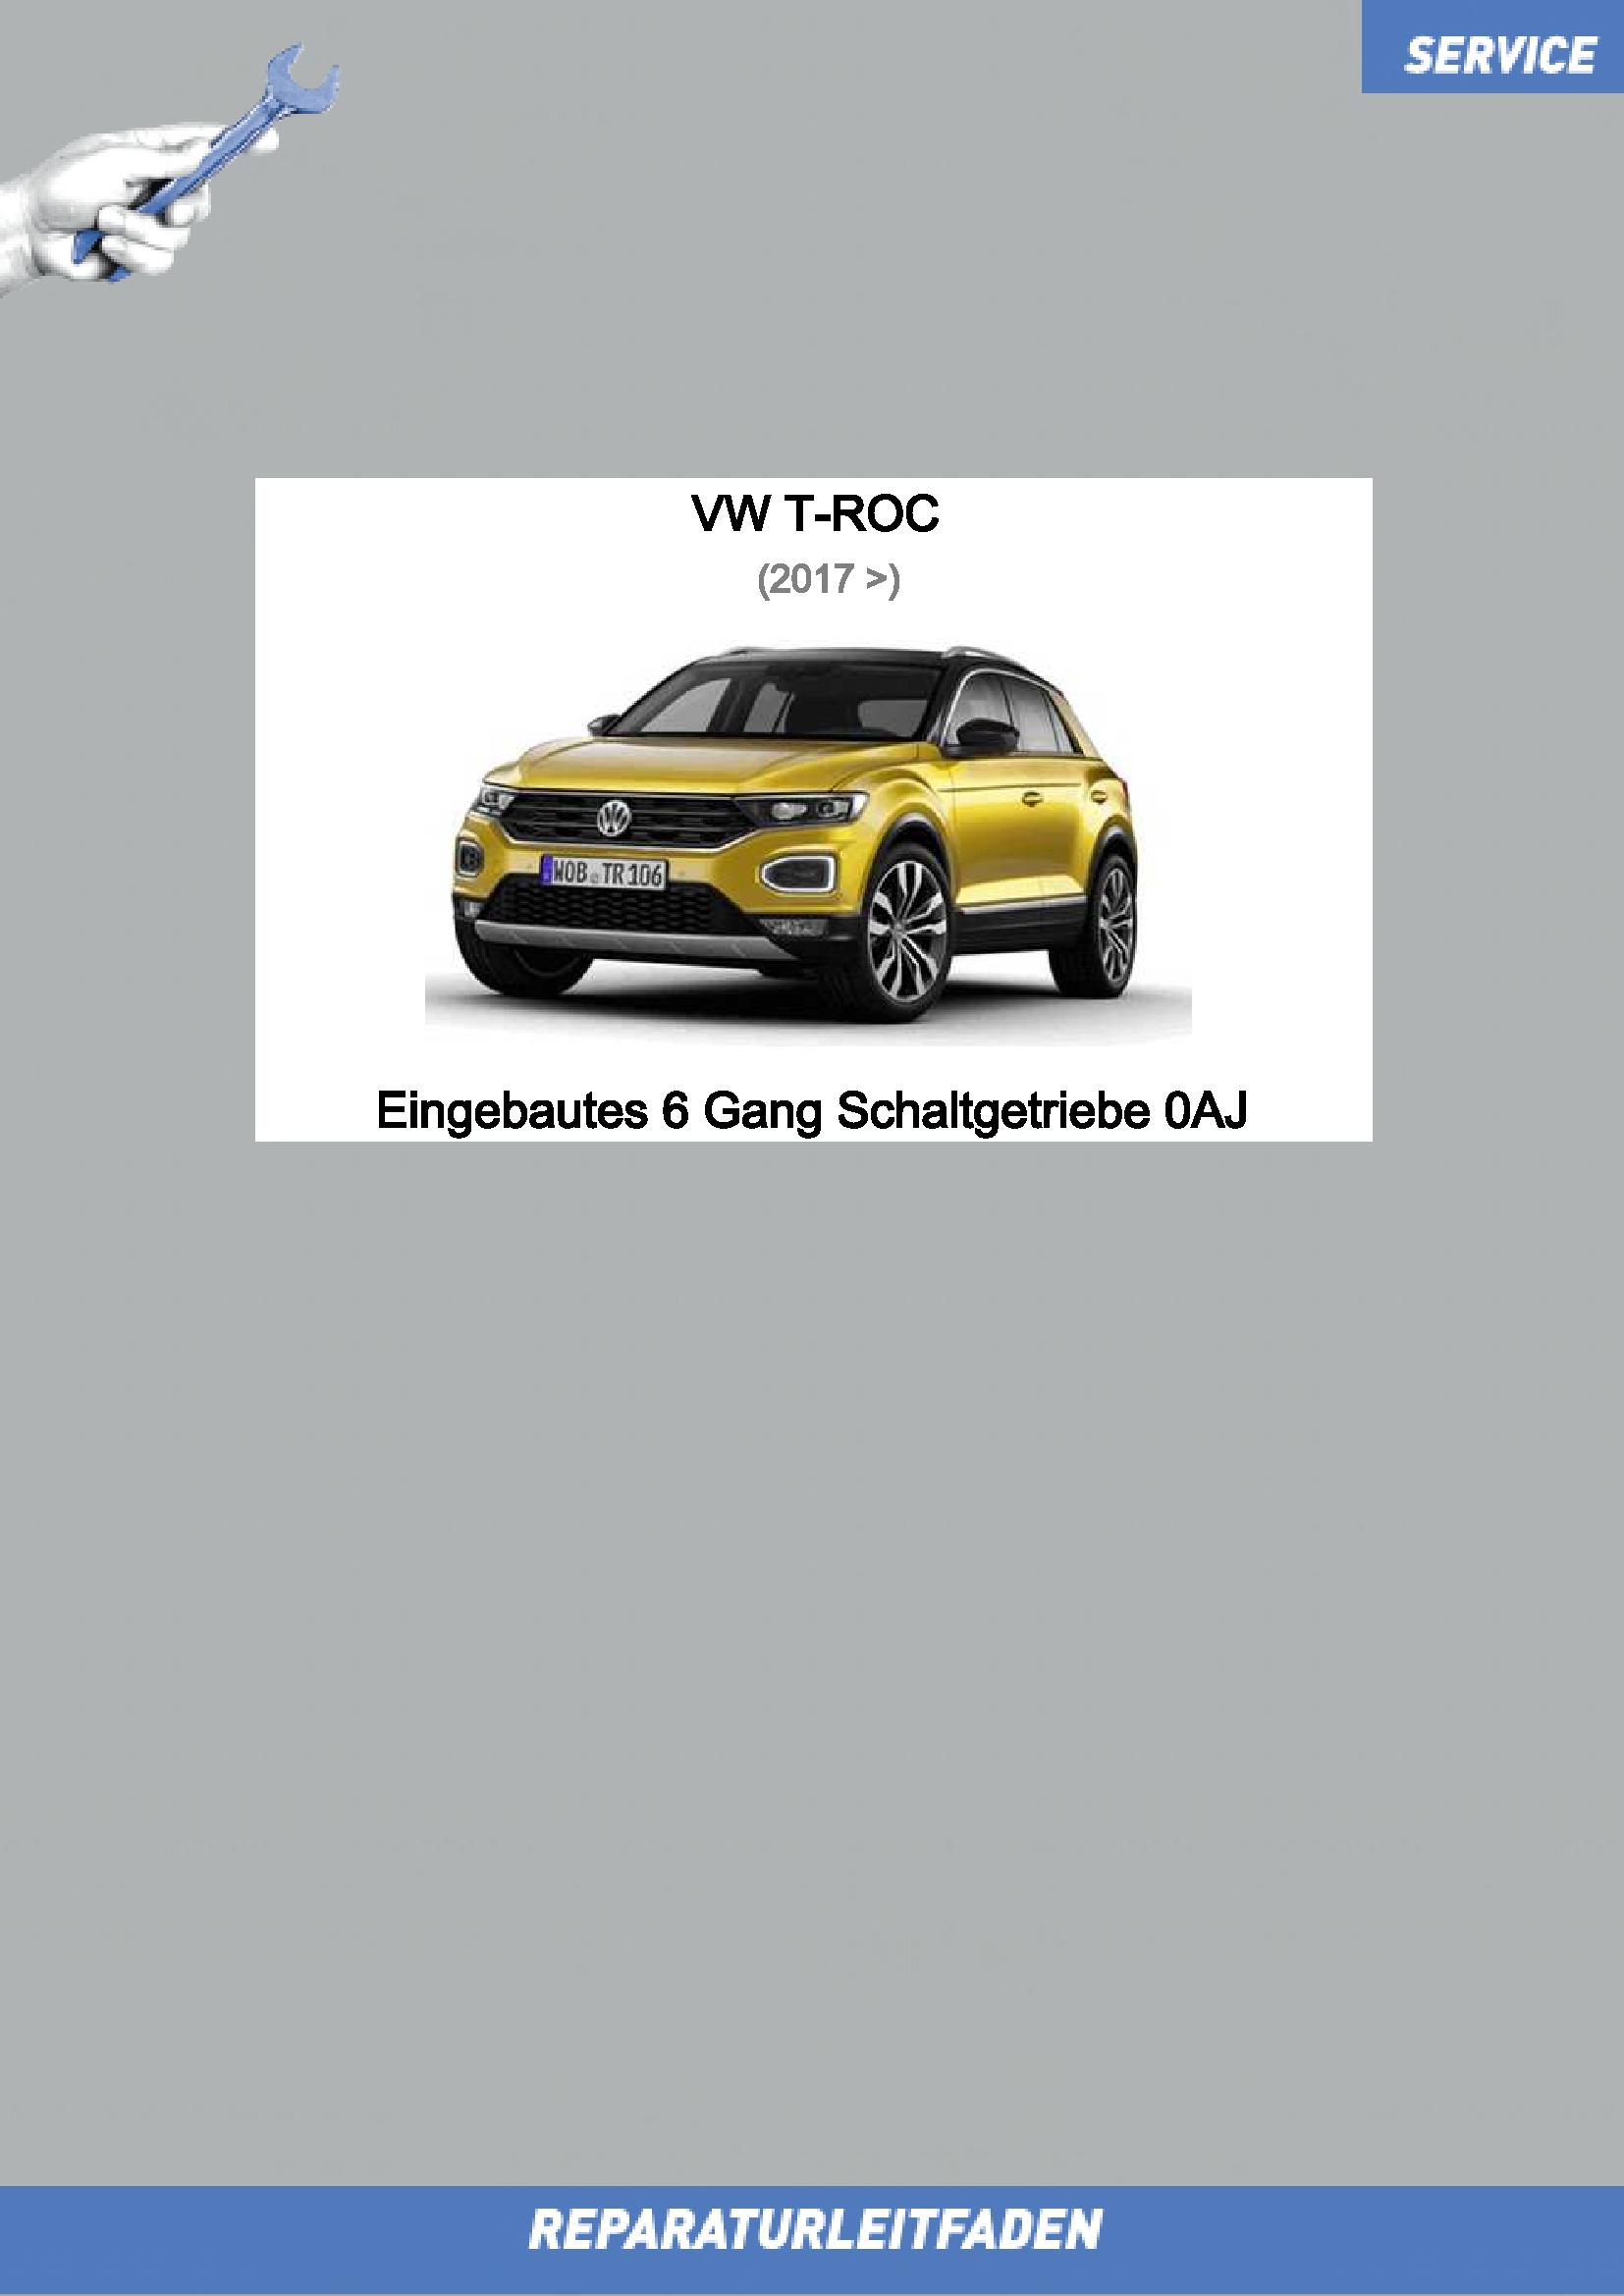 vw-t-roc-0019-eingebautes_6_gang_schaltgetriebe_0aj_1.png